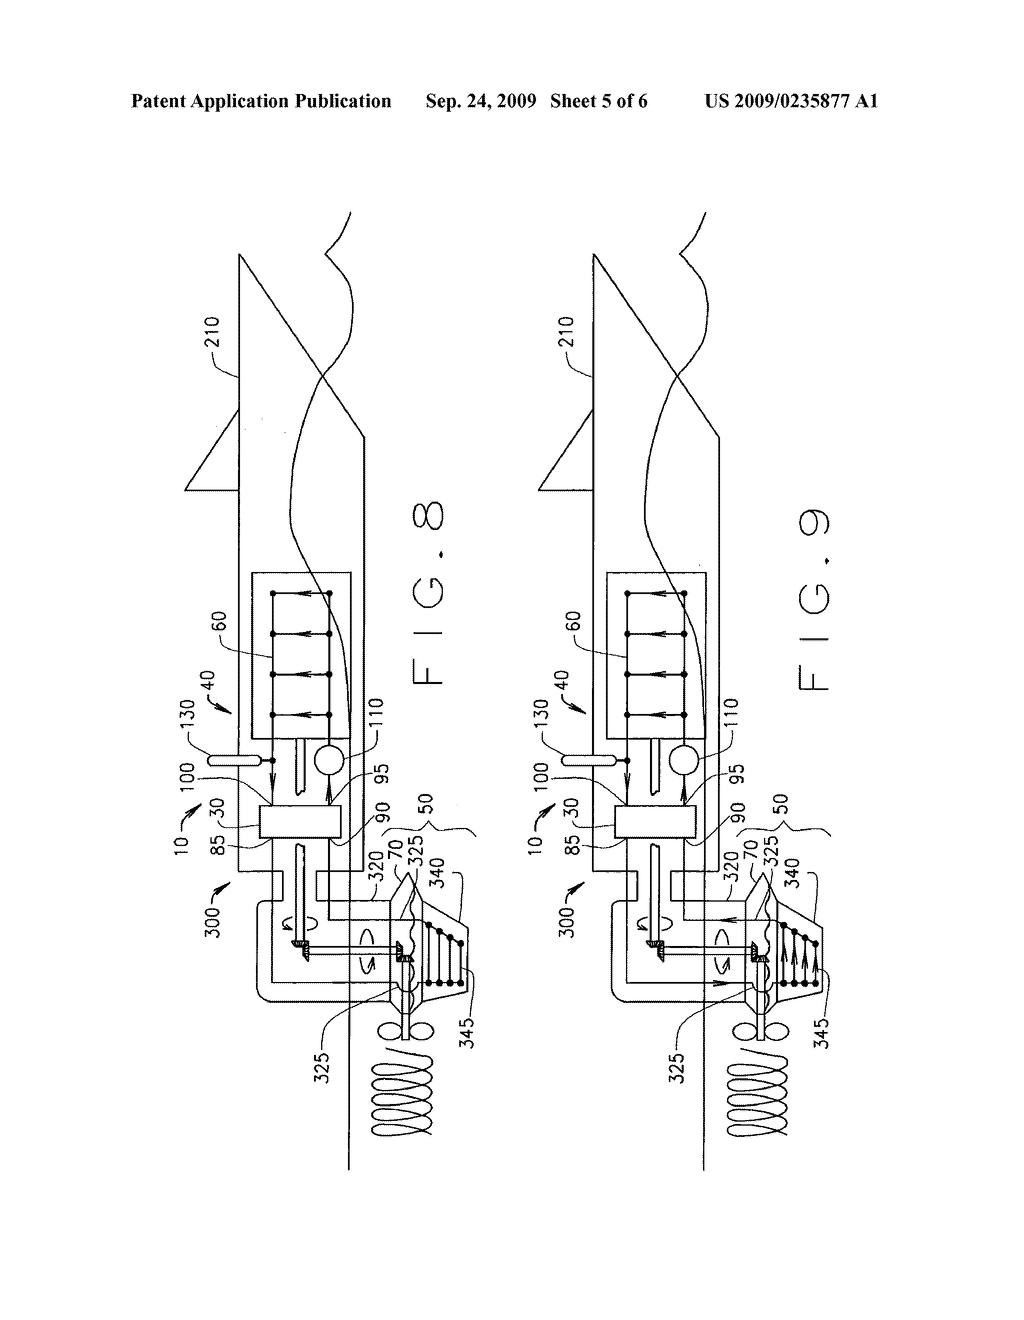 Inboard Outboard Motor Cooling System Automotivegarage Org